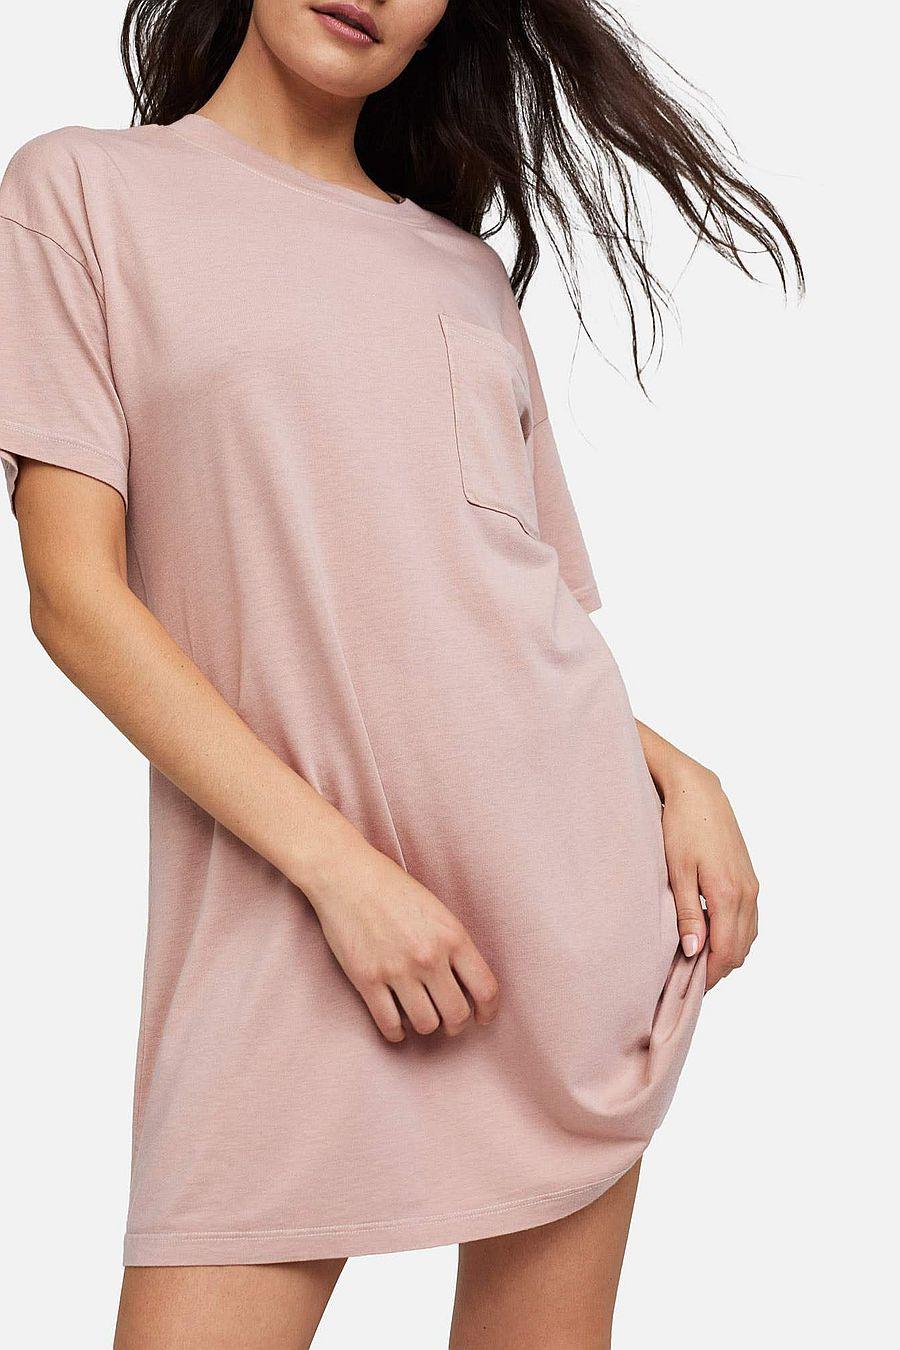 MATE The Label Tencel Sleep Tee Dress - ROSE